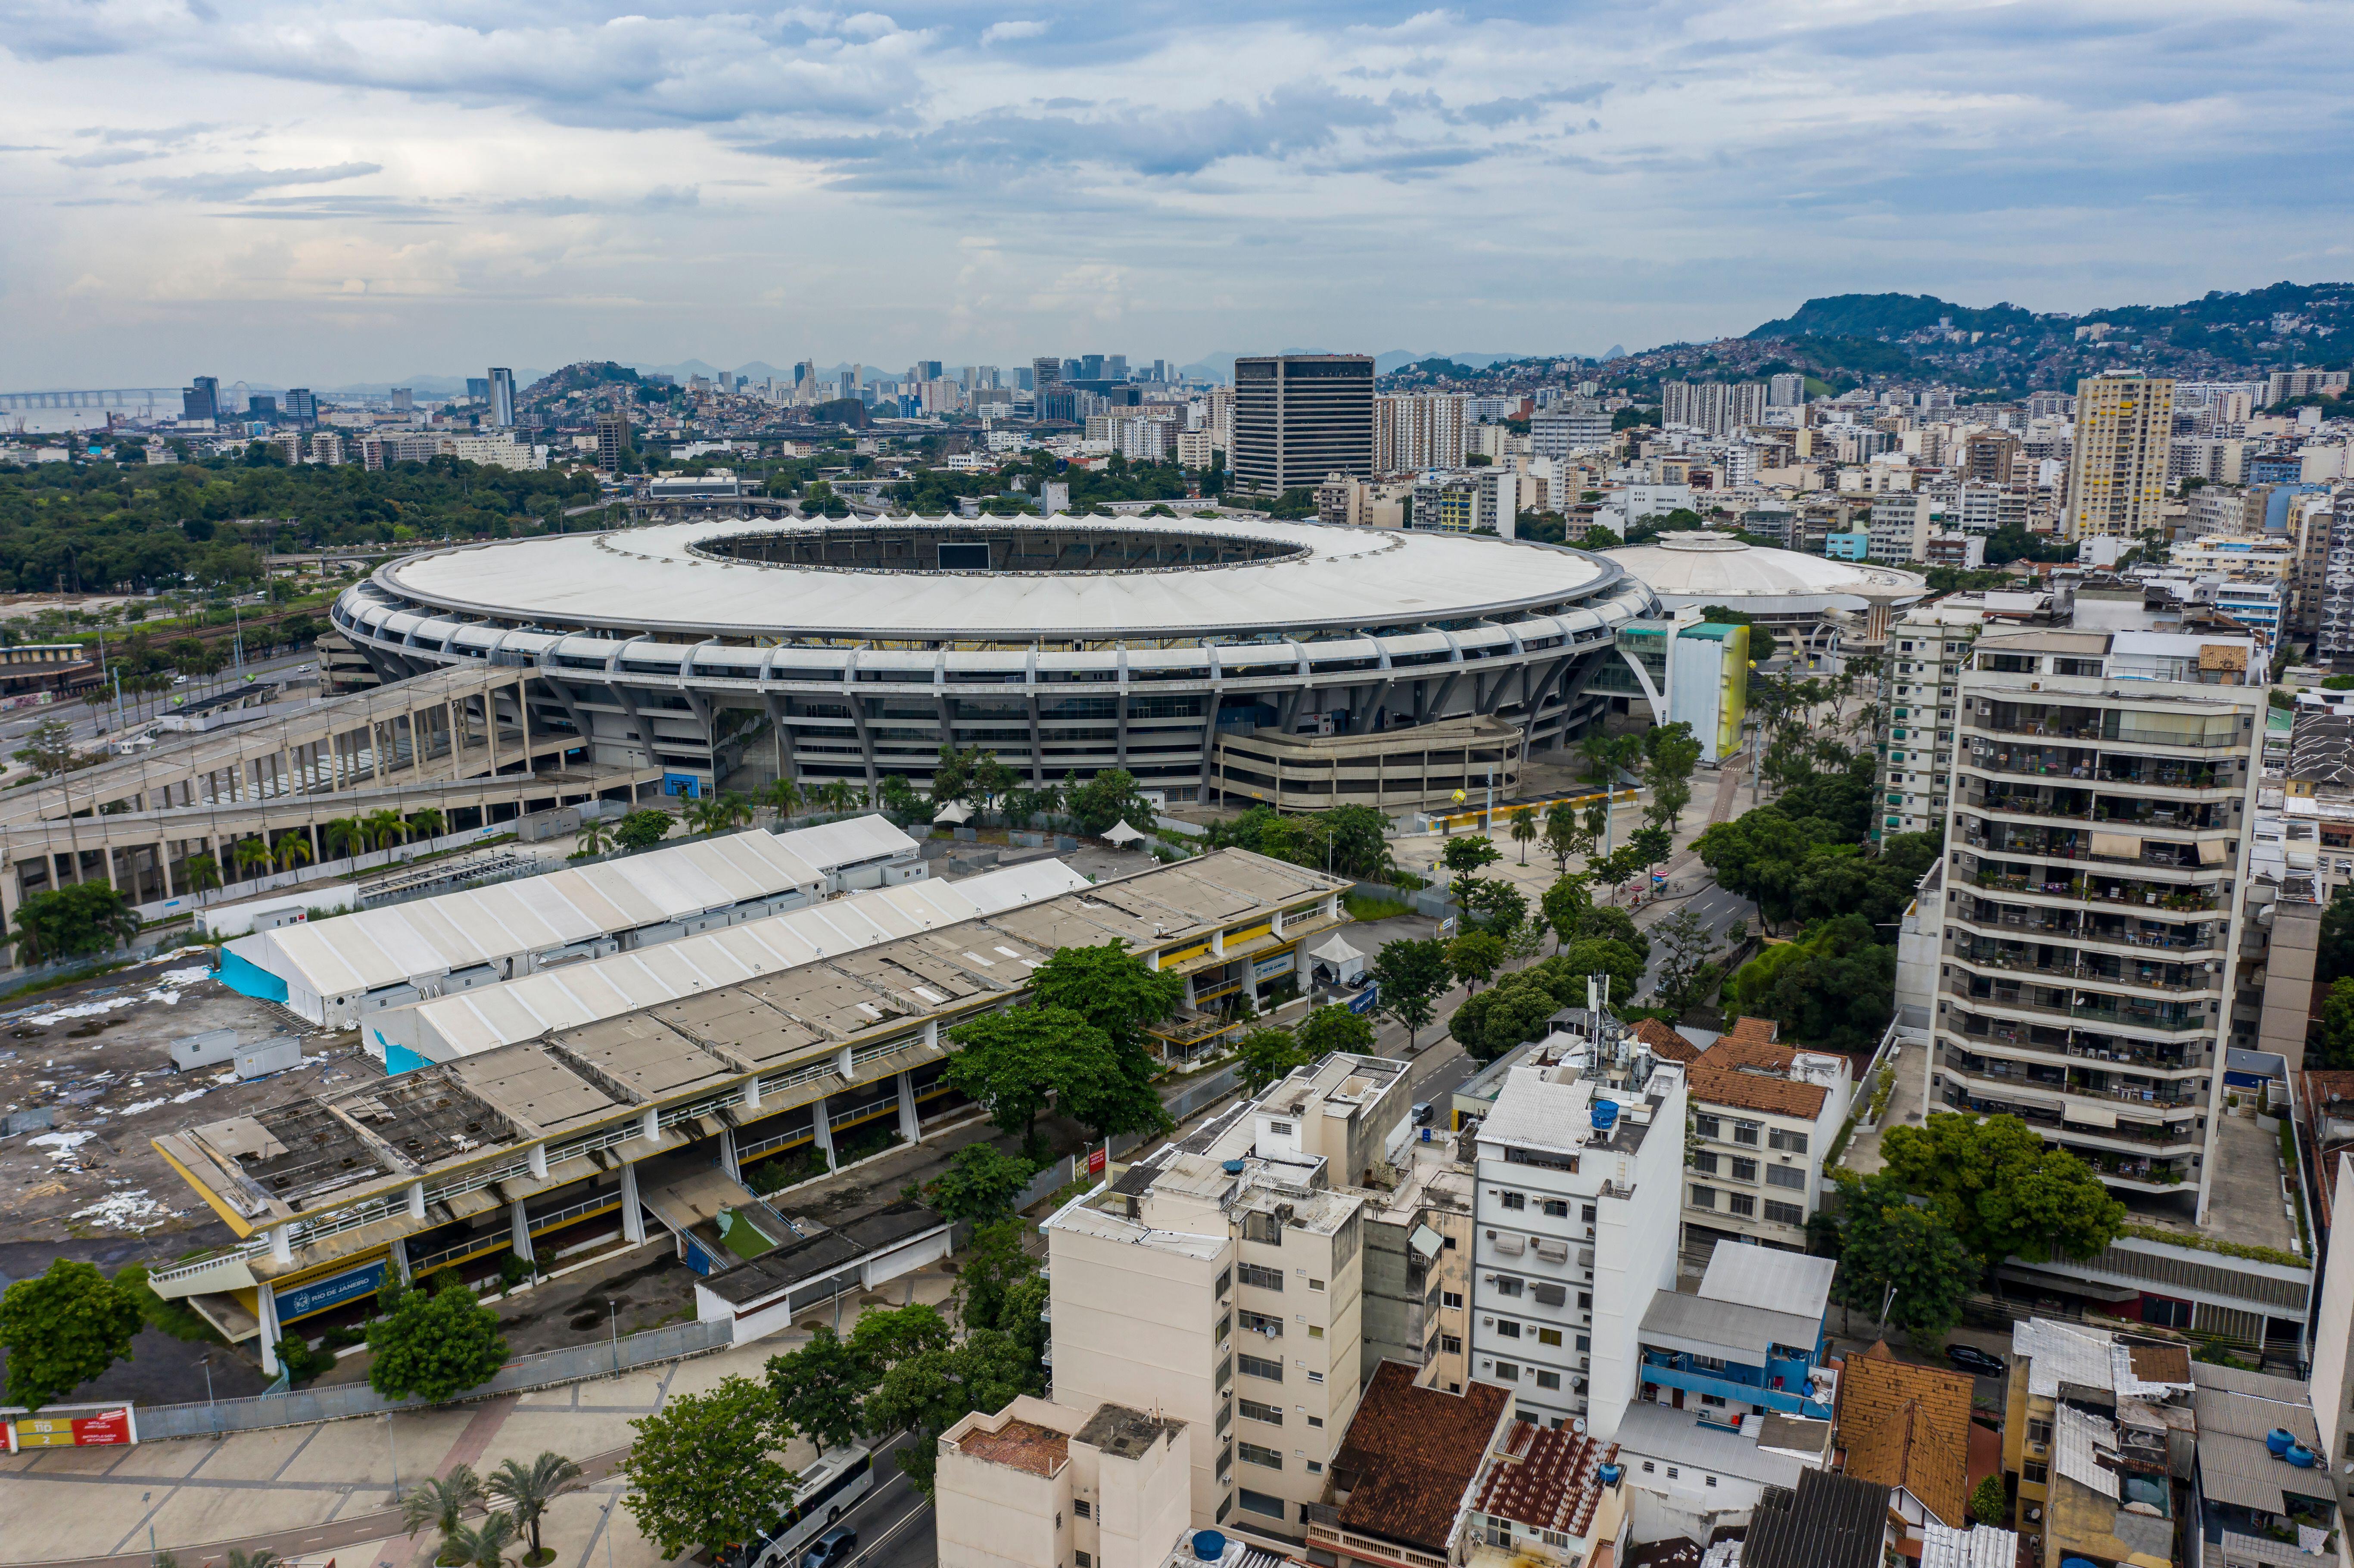 Brazilian clubs rock the boat – a trend developing across world football